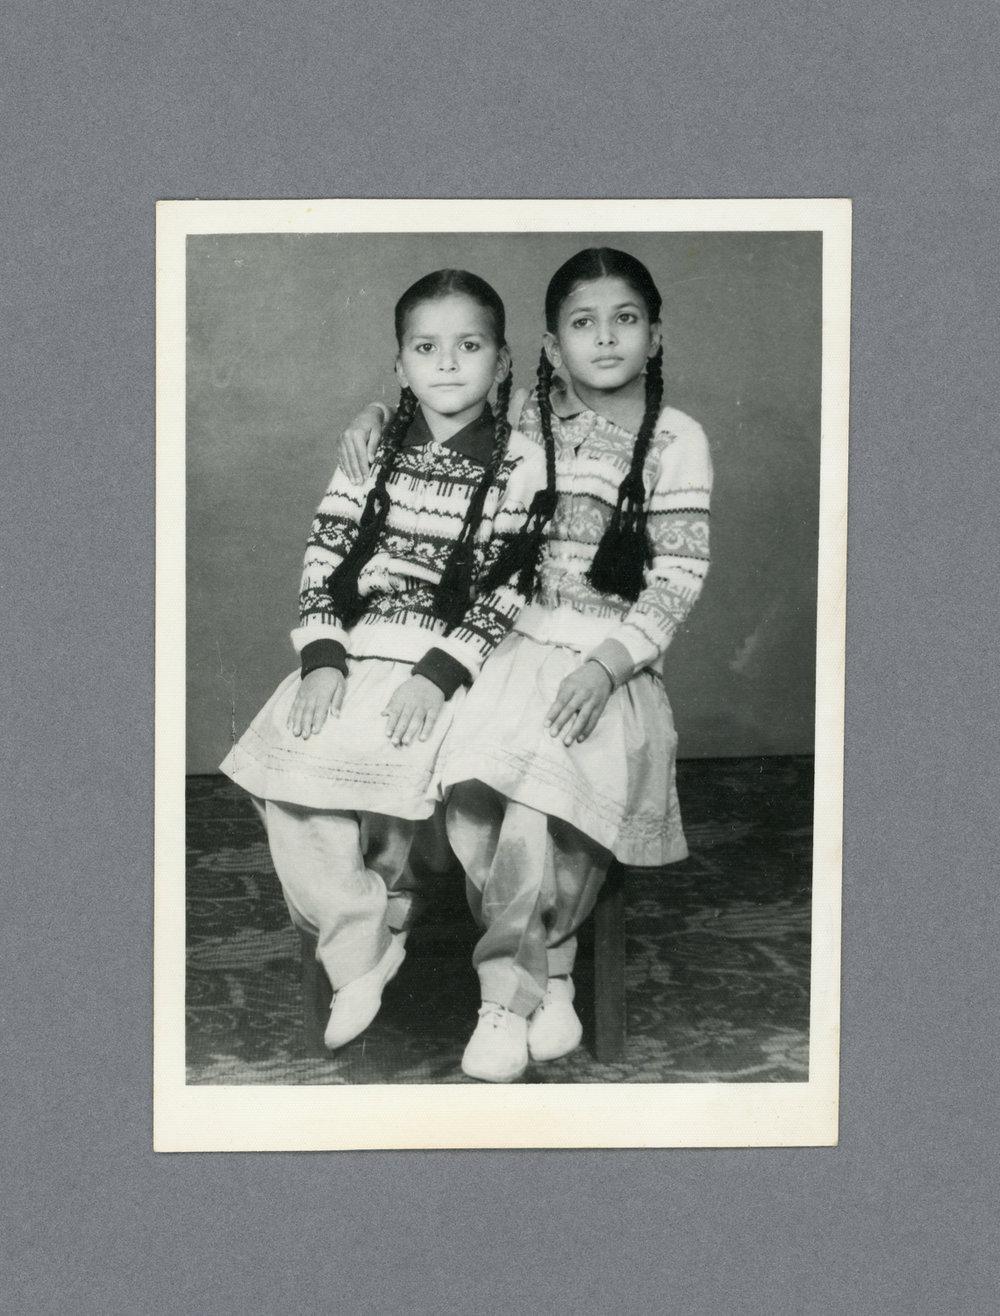 Punjab, India c.1964